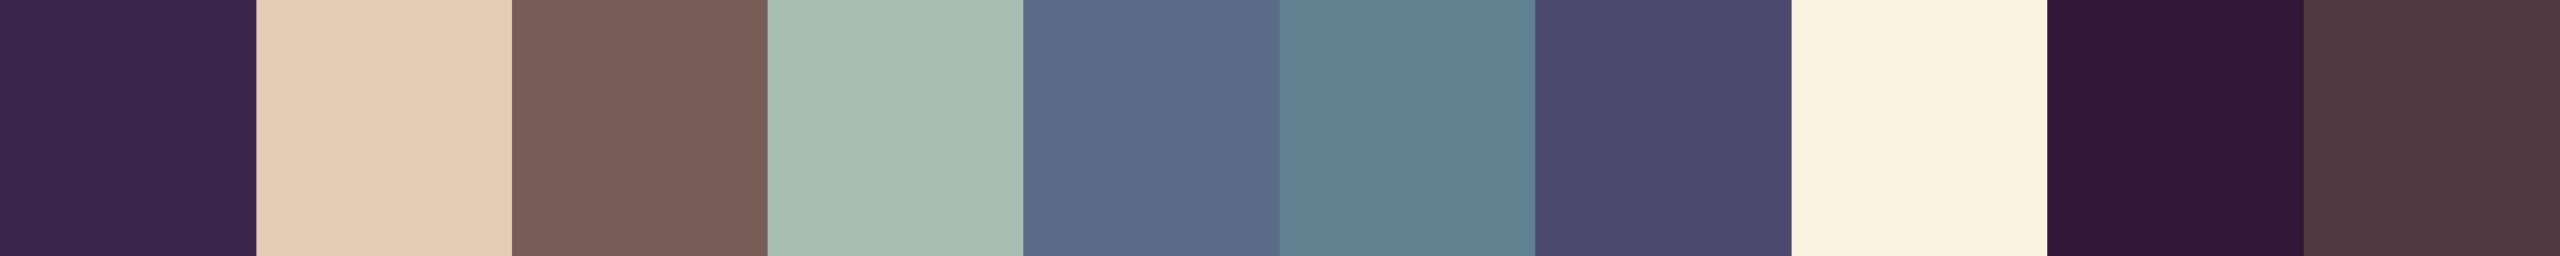 434 Sostila Color Palette